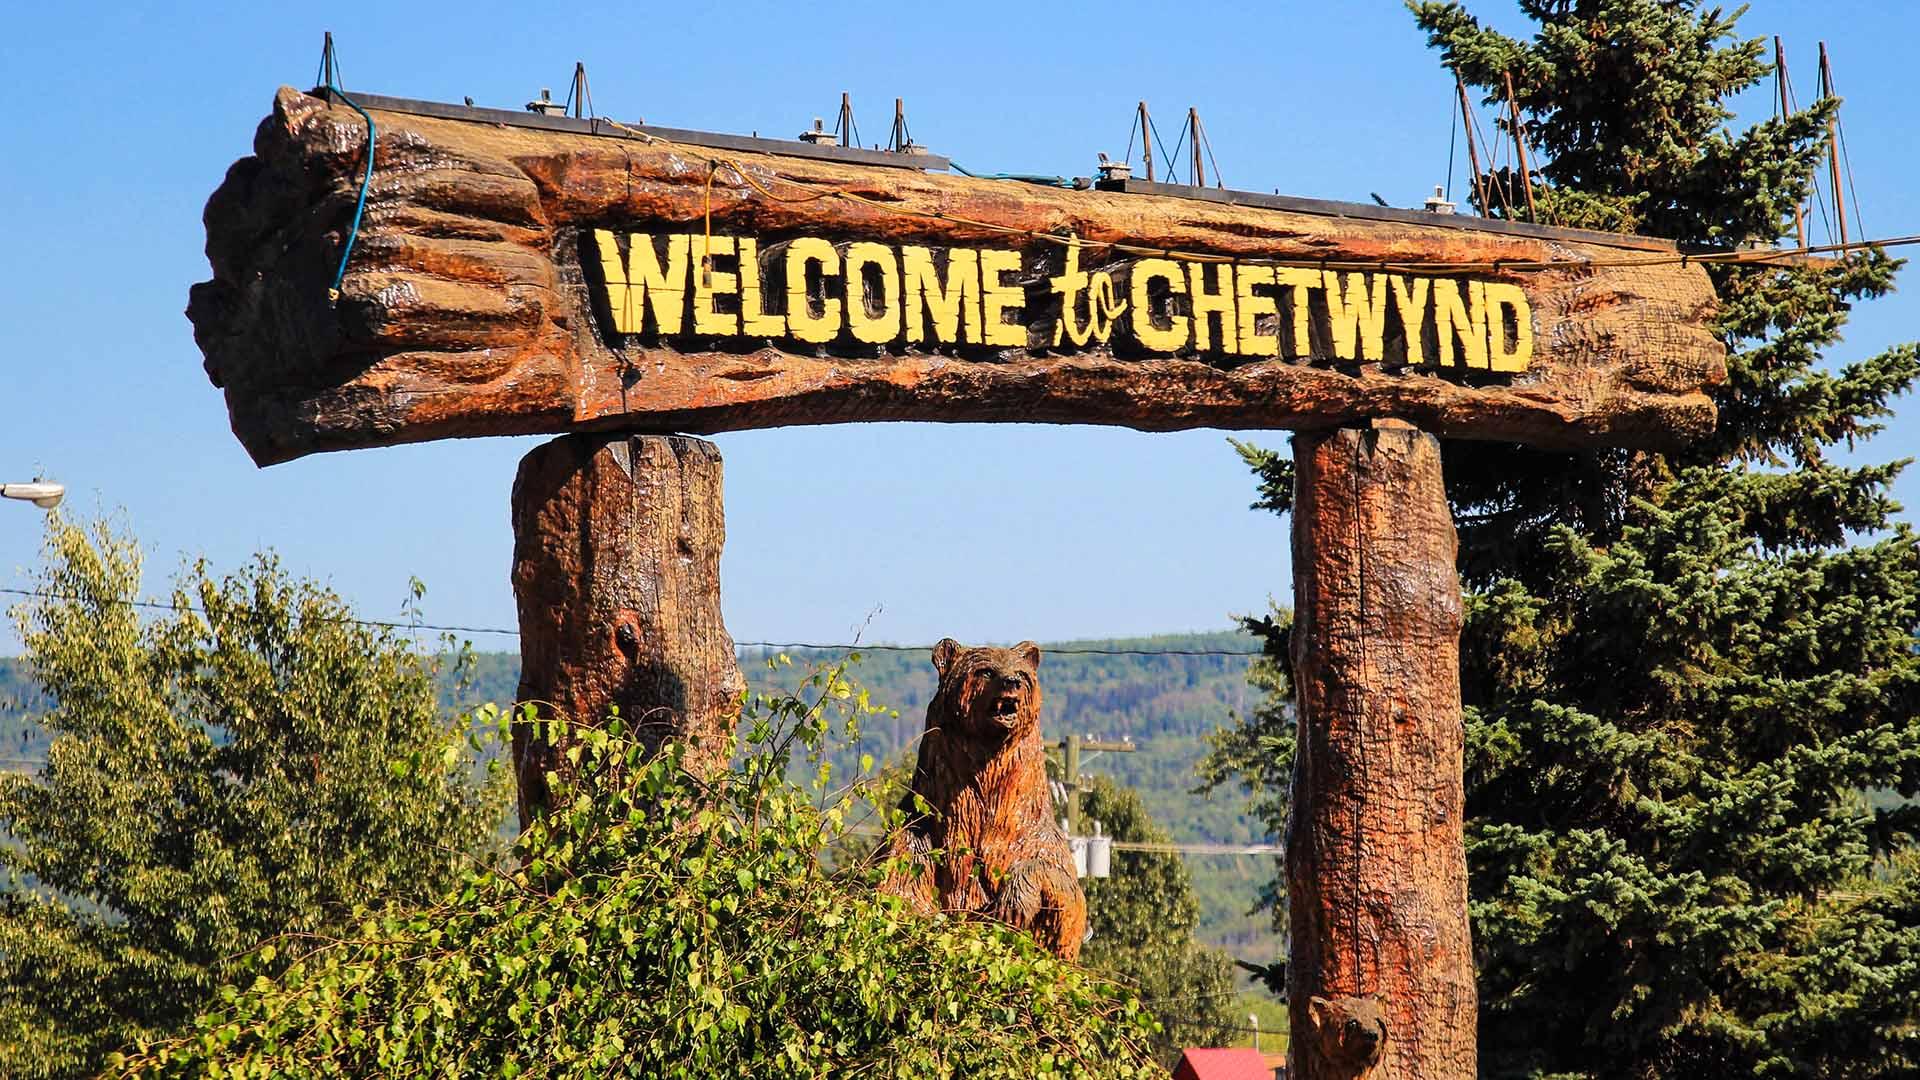 Top 5 Sehenswürdigkeiten in Chetwynd - Cover